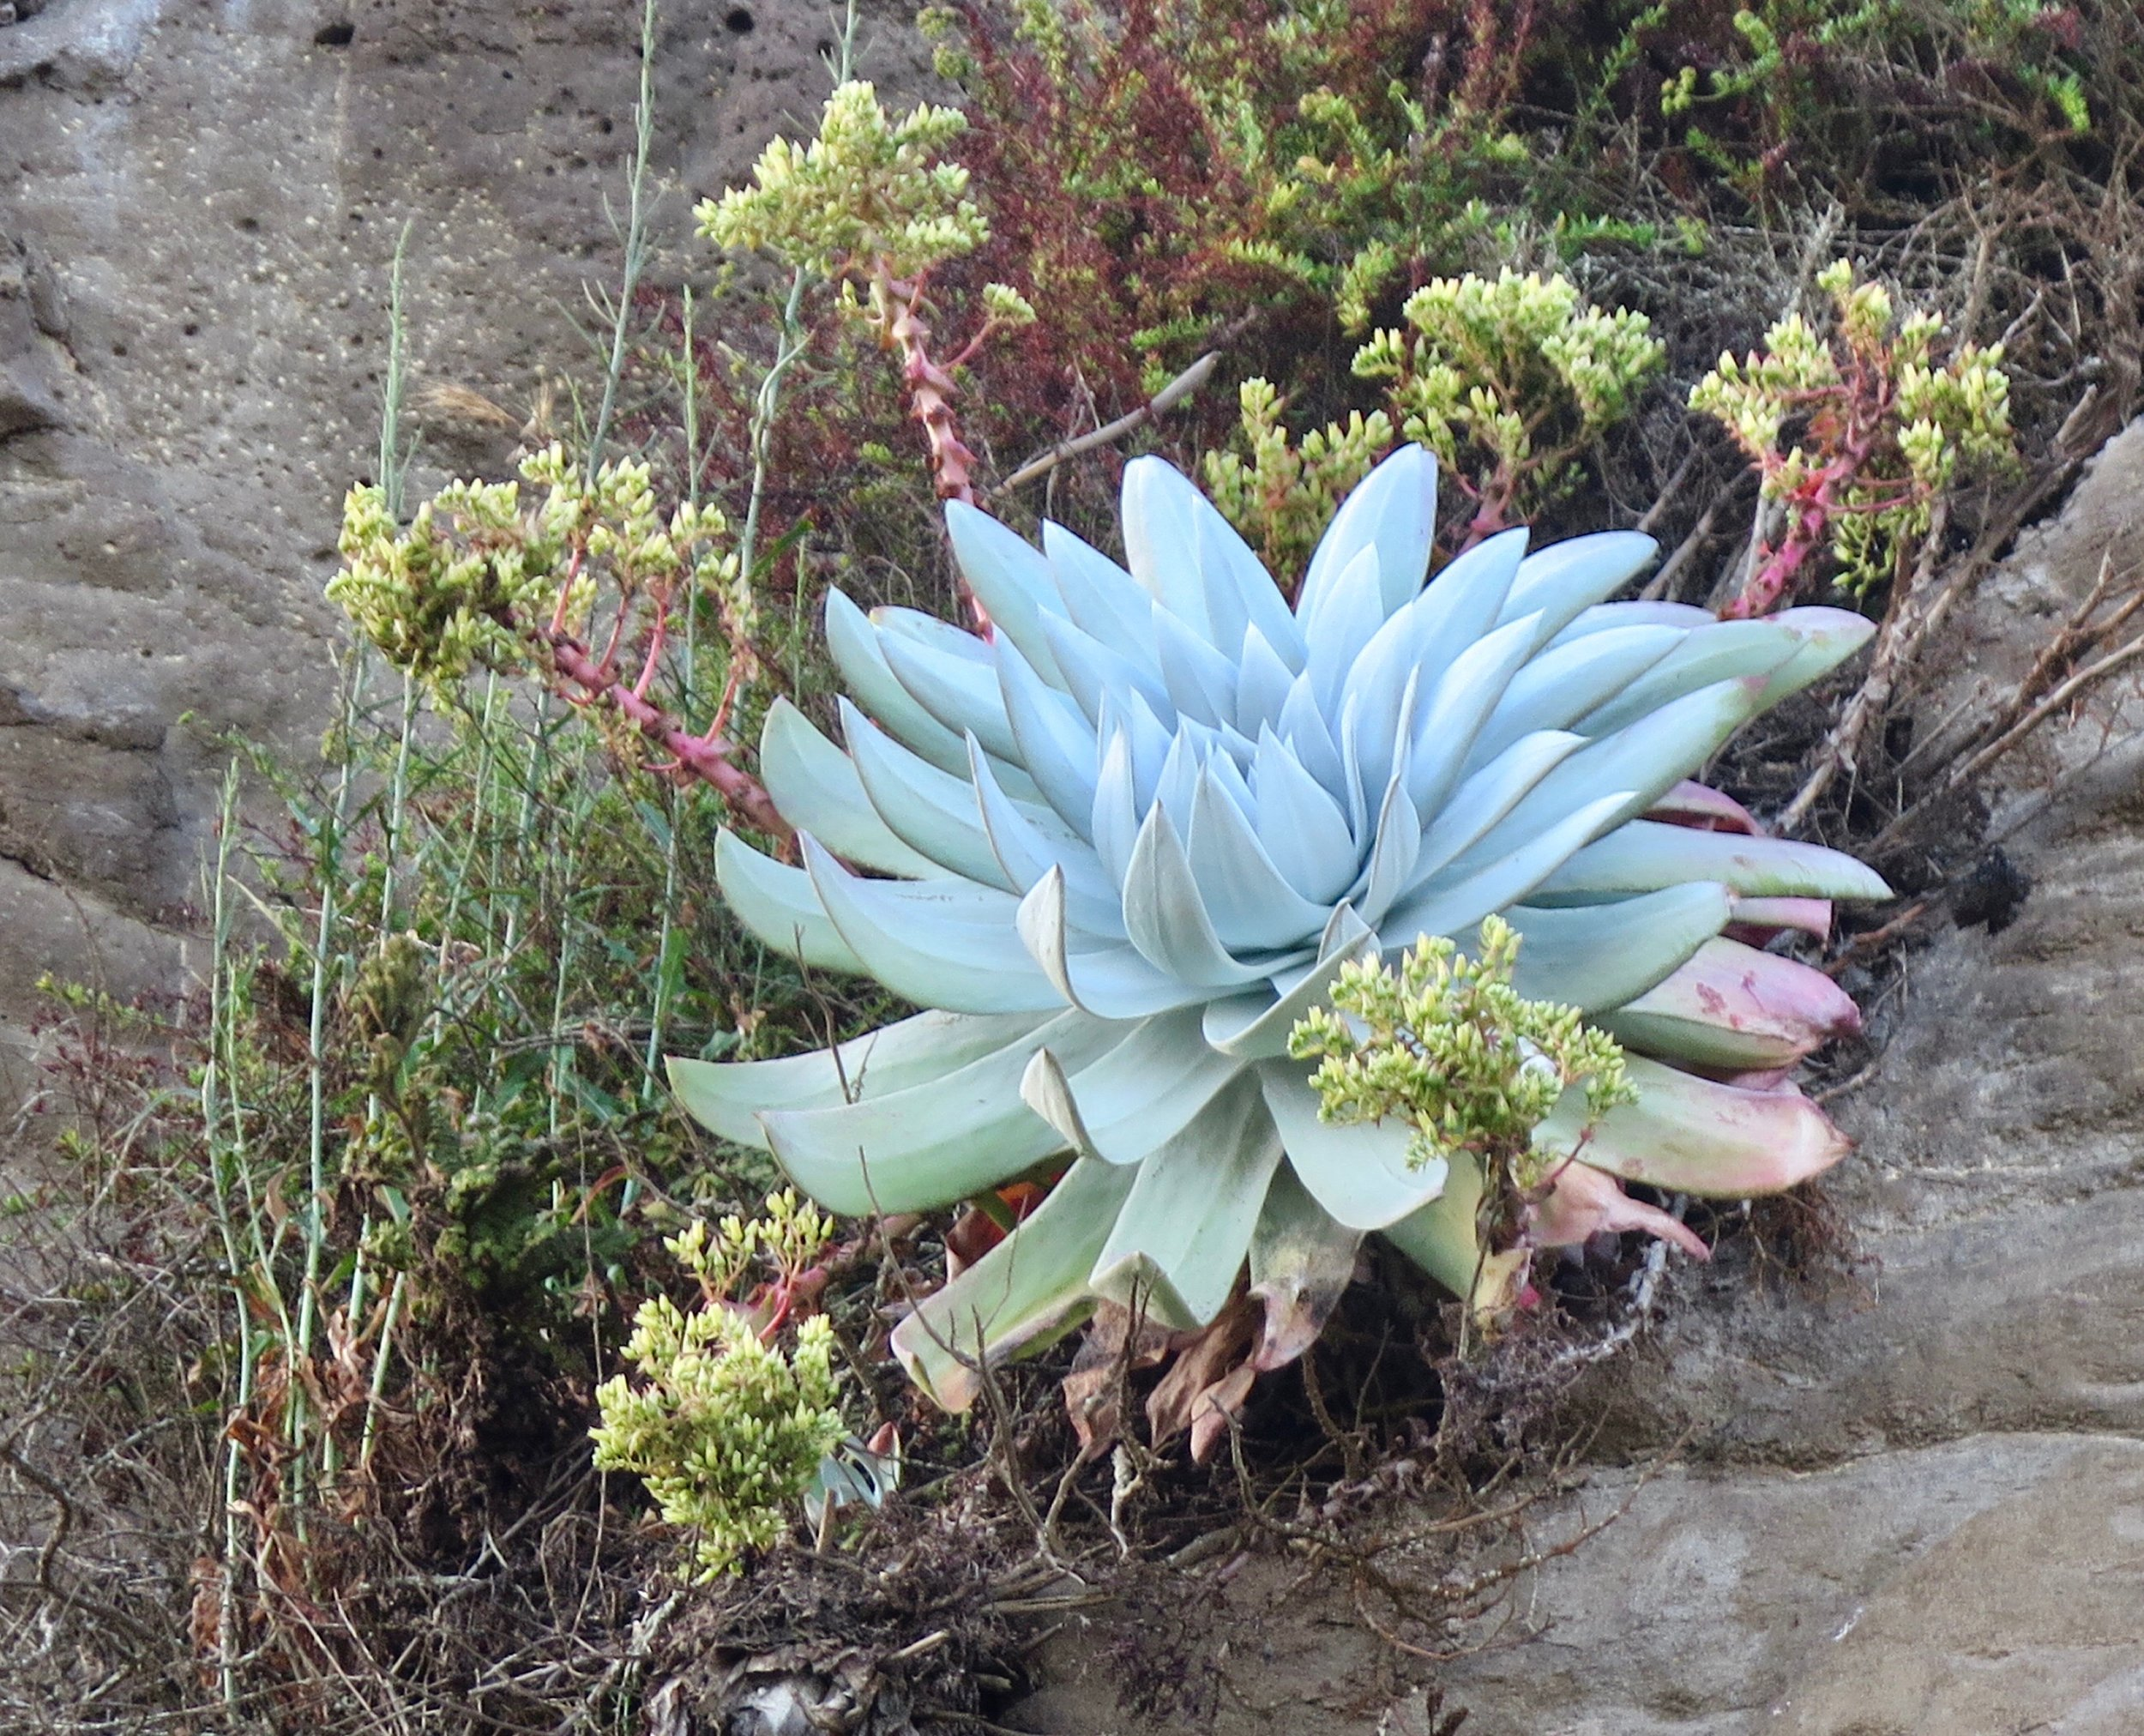 Photographed near Ensenada, Baja California.